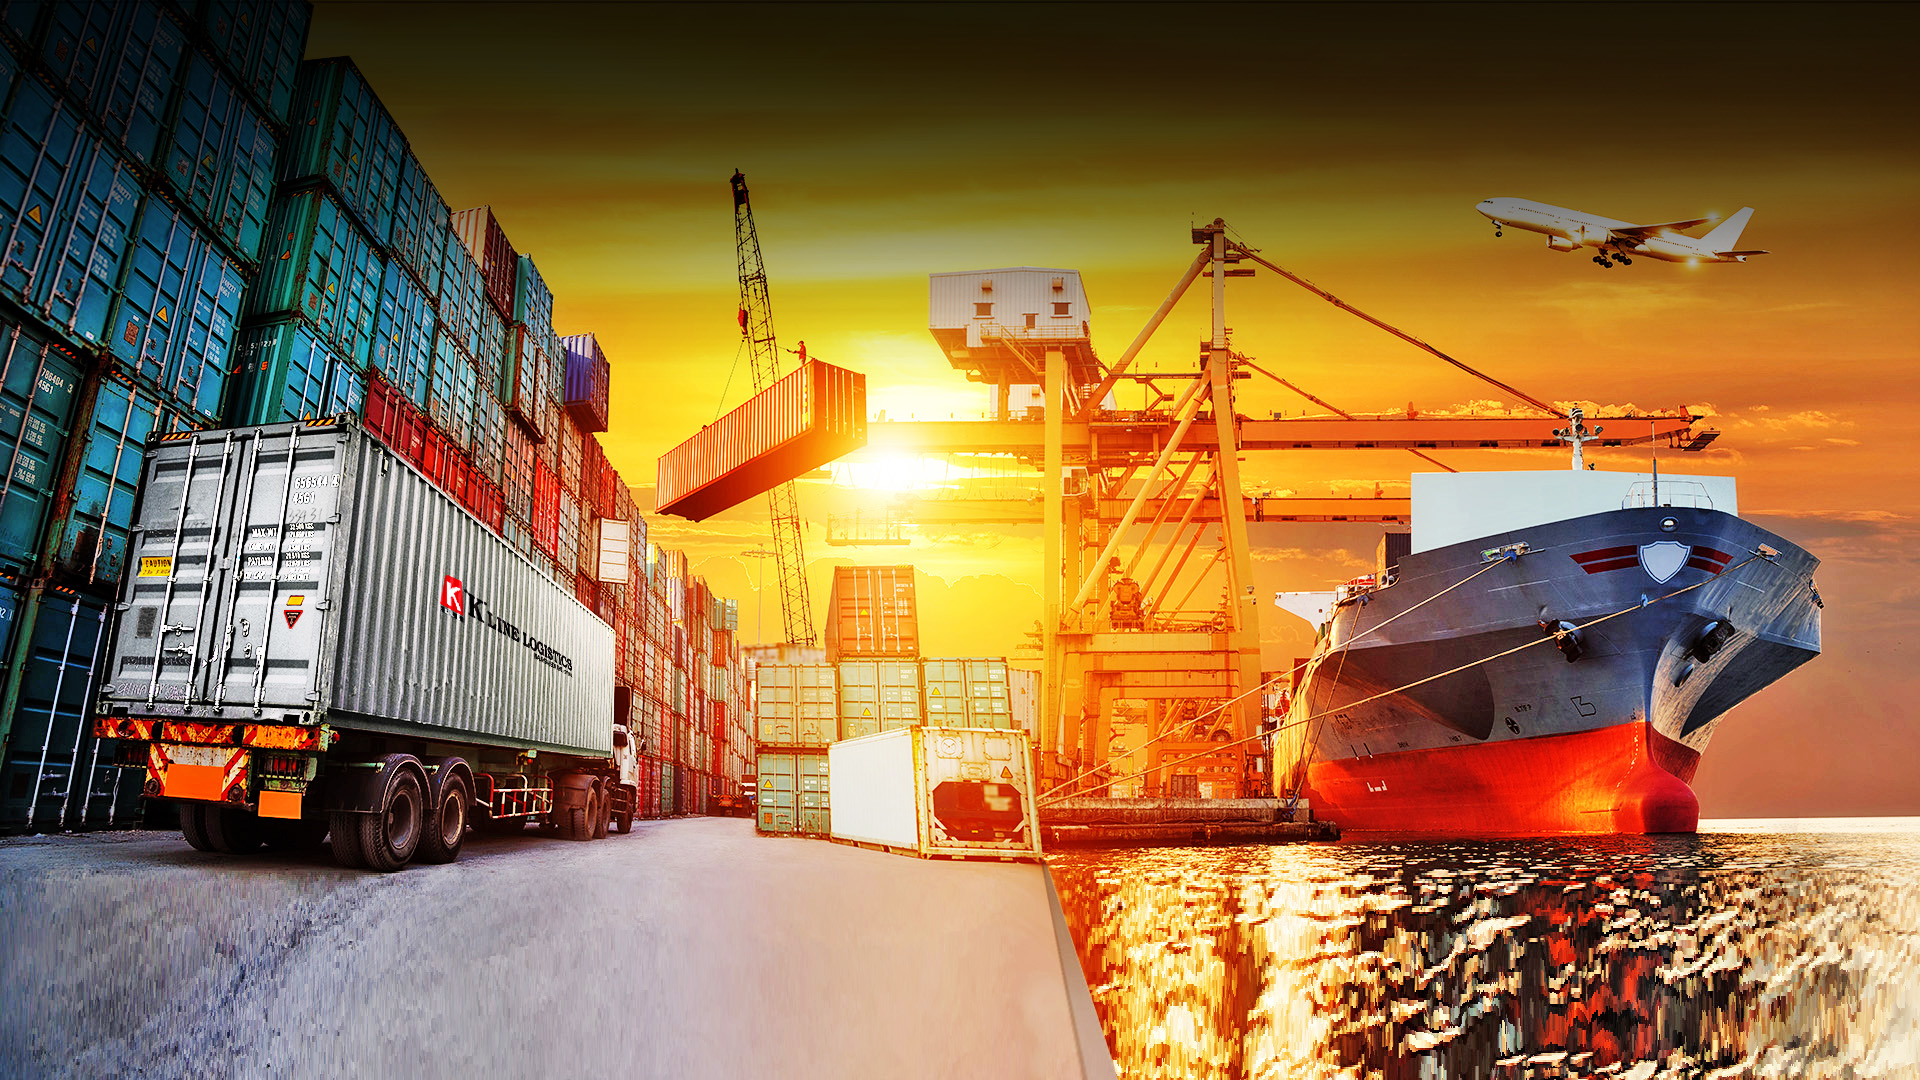 Nomor Identitas Kepabeanan Perusahaan Angkutan Laut (